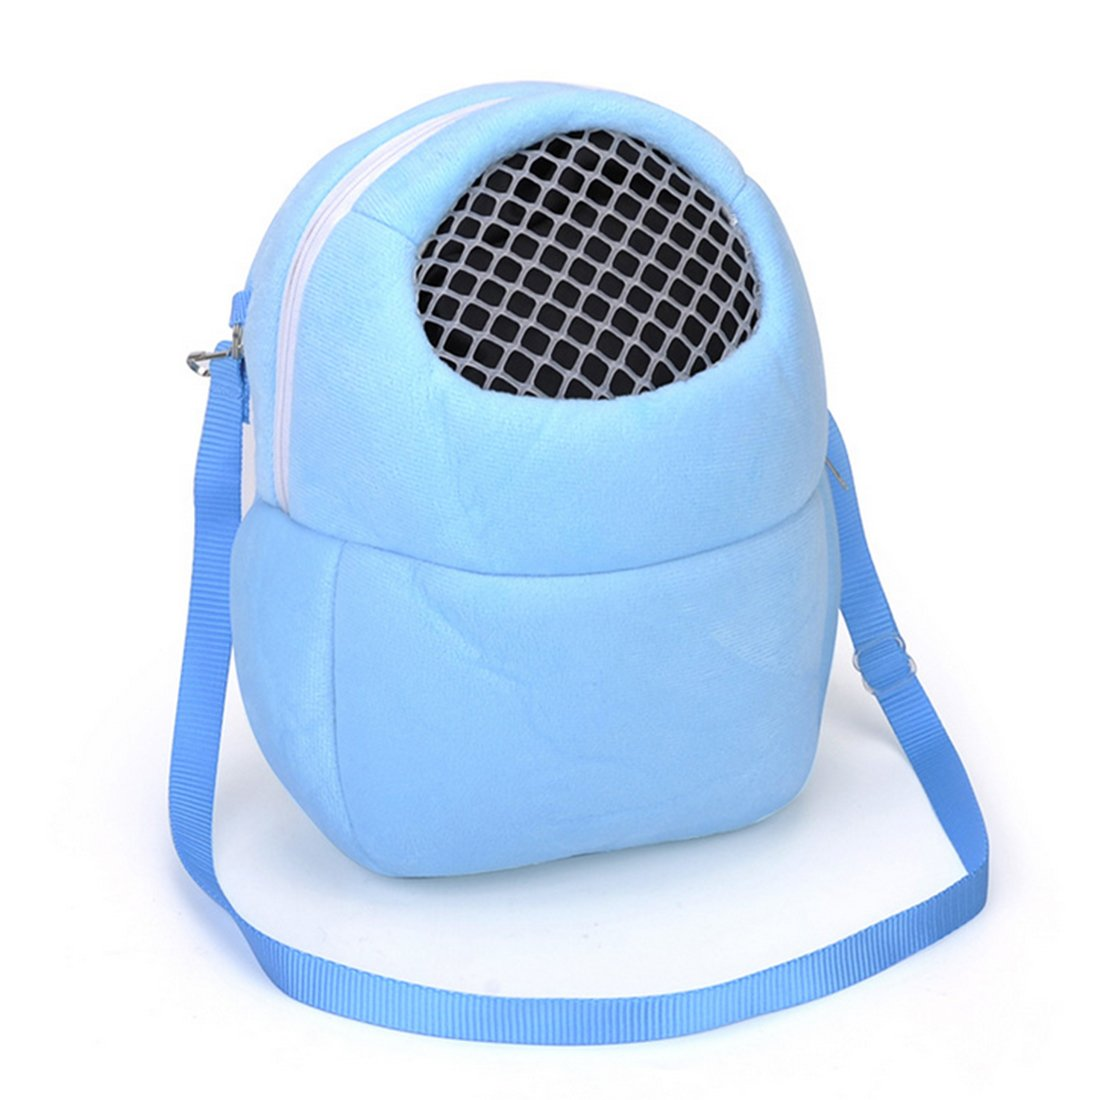 Pet Carrier Bags, Petforu Sleeping Bag Warm for Hamster /Hedgies /Squirrel /Chinchilla (Large)